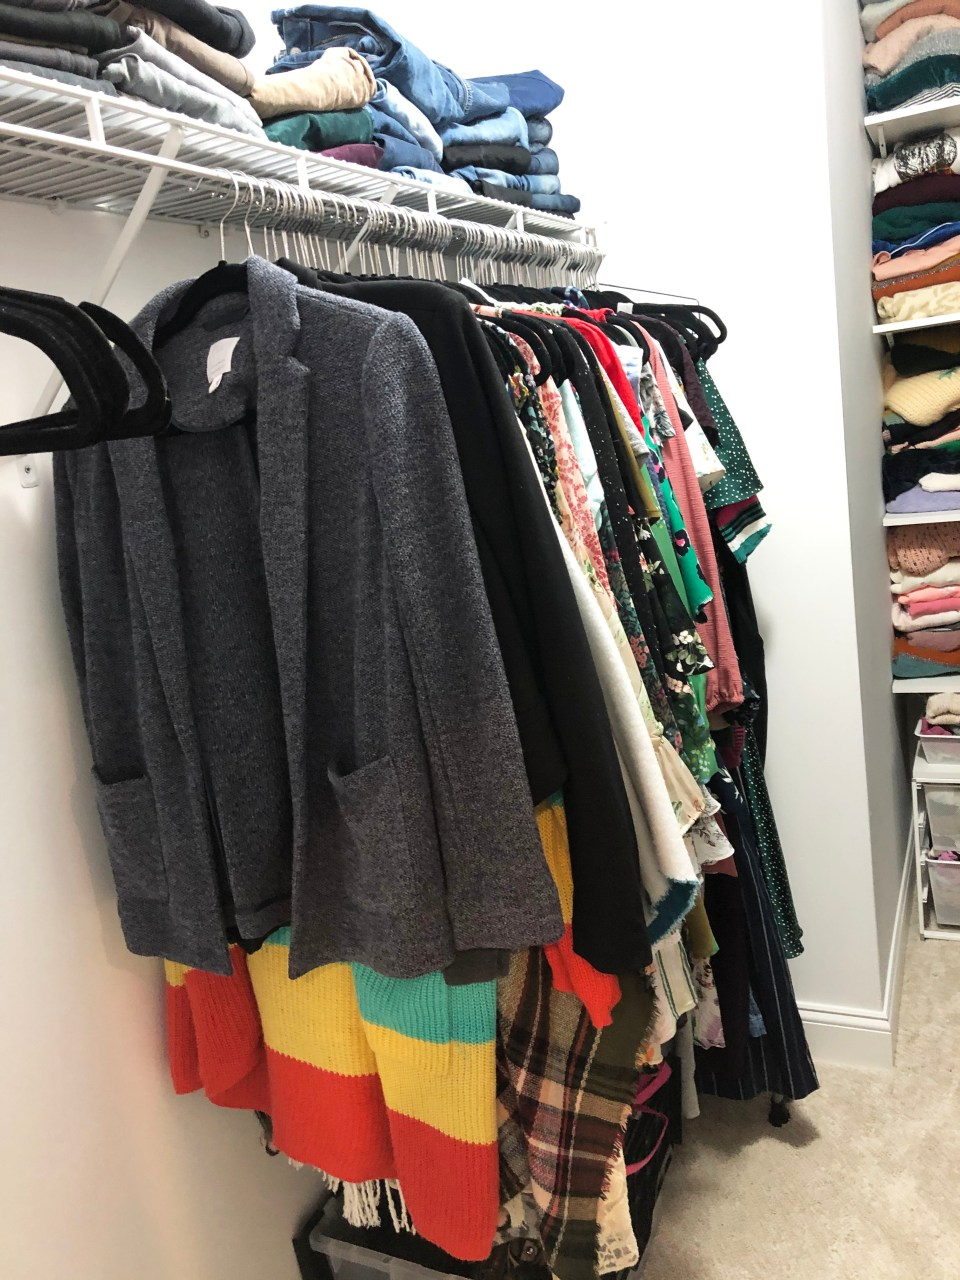 Walk-In Closet Renovation 18